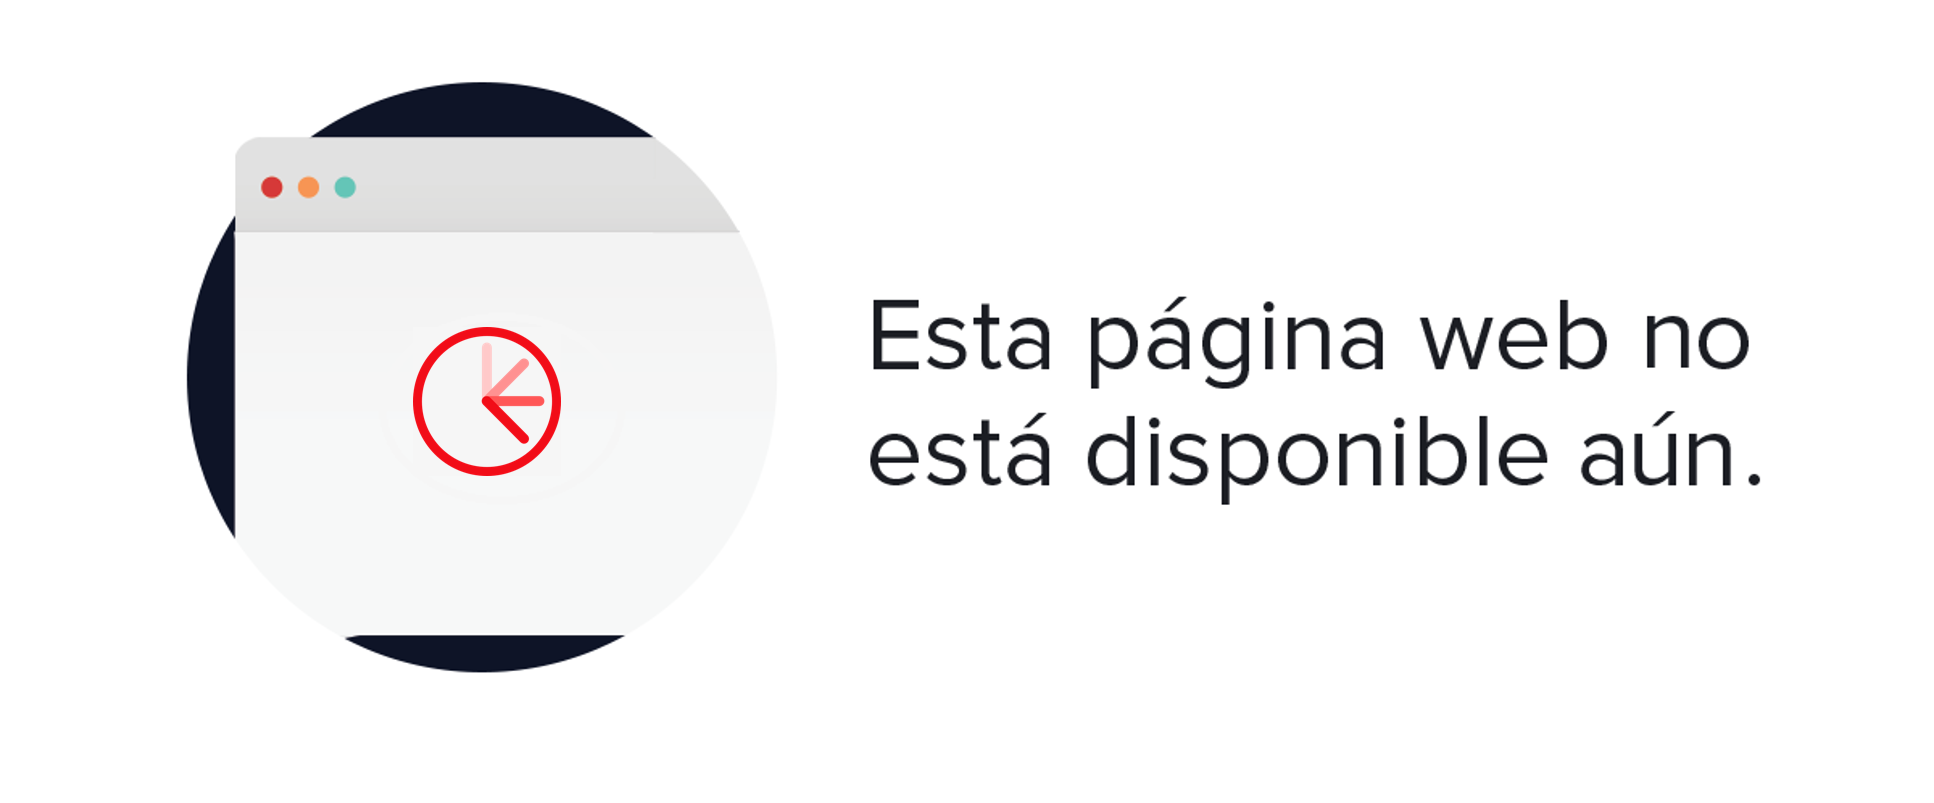 OXXO - Falda de mujer OXXO corta con cintura elástica Naranja 8681613249738 - UOXXRIP